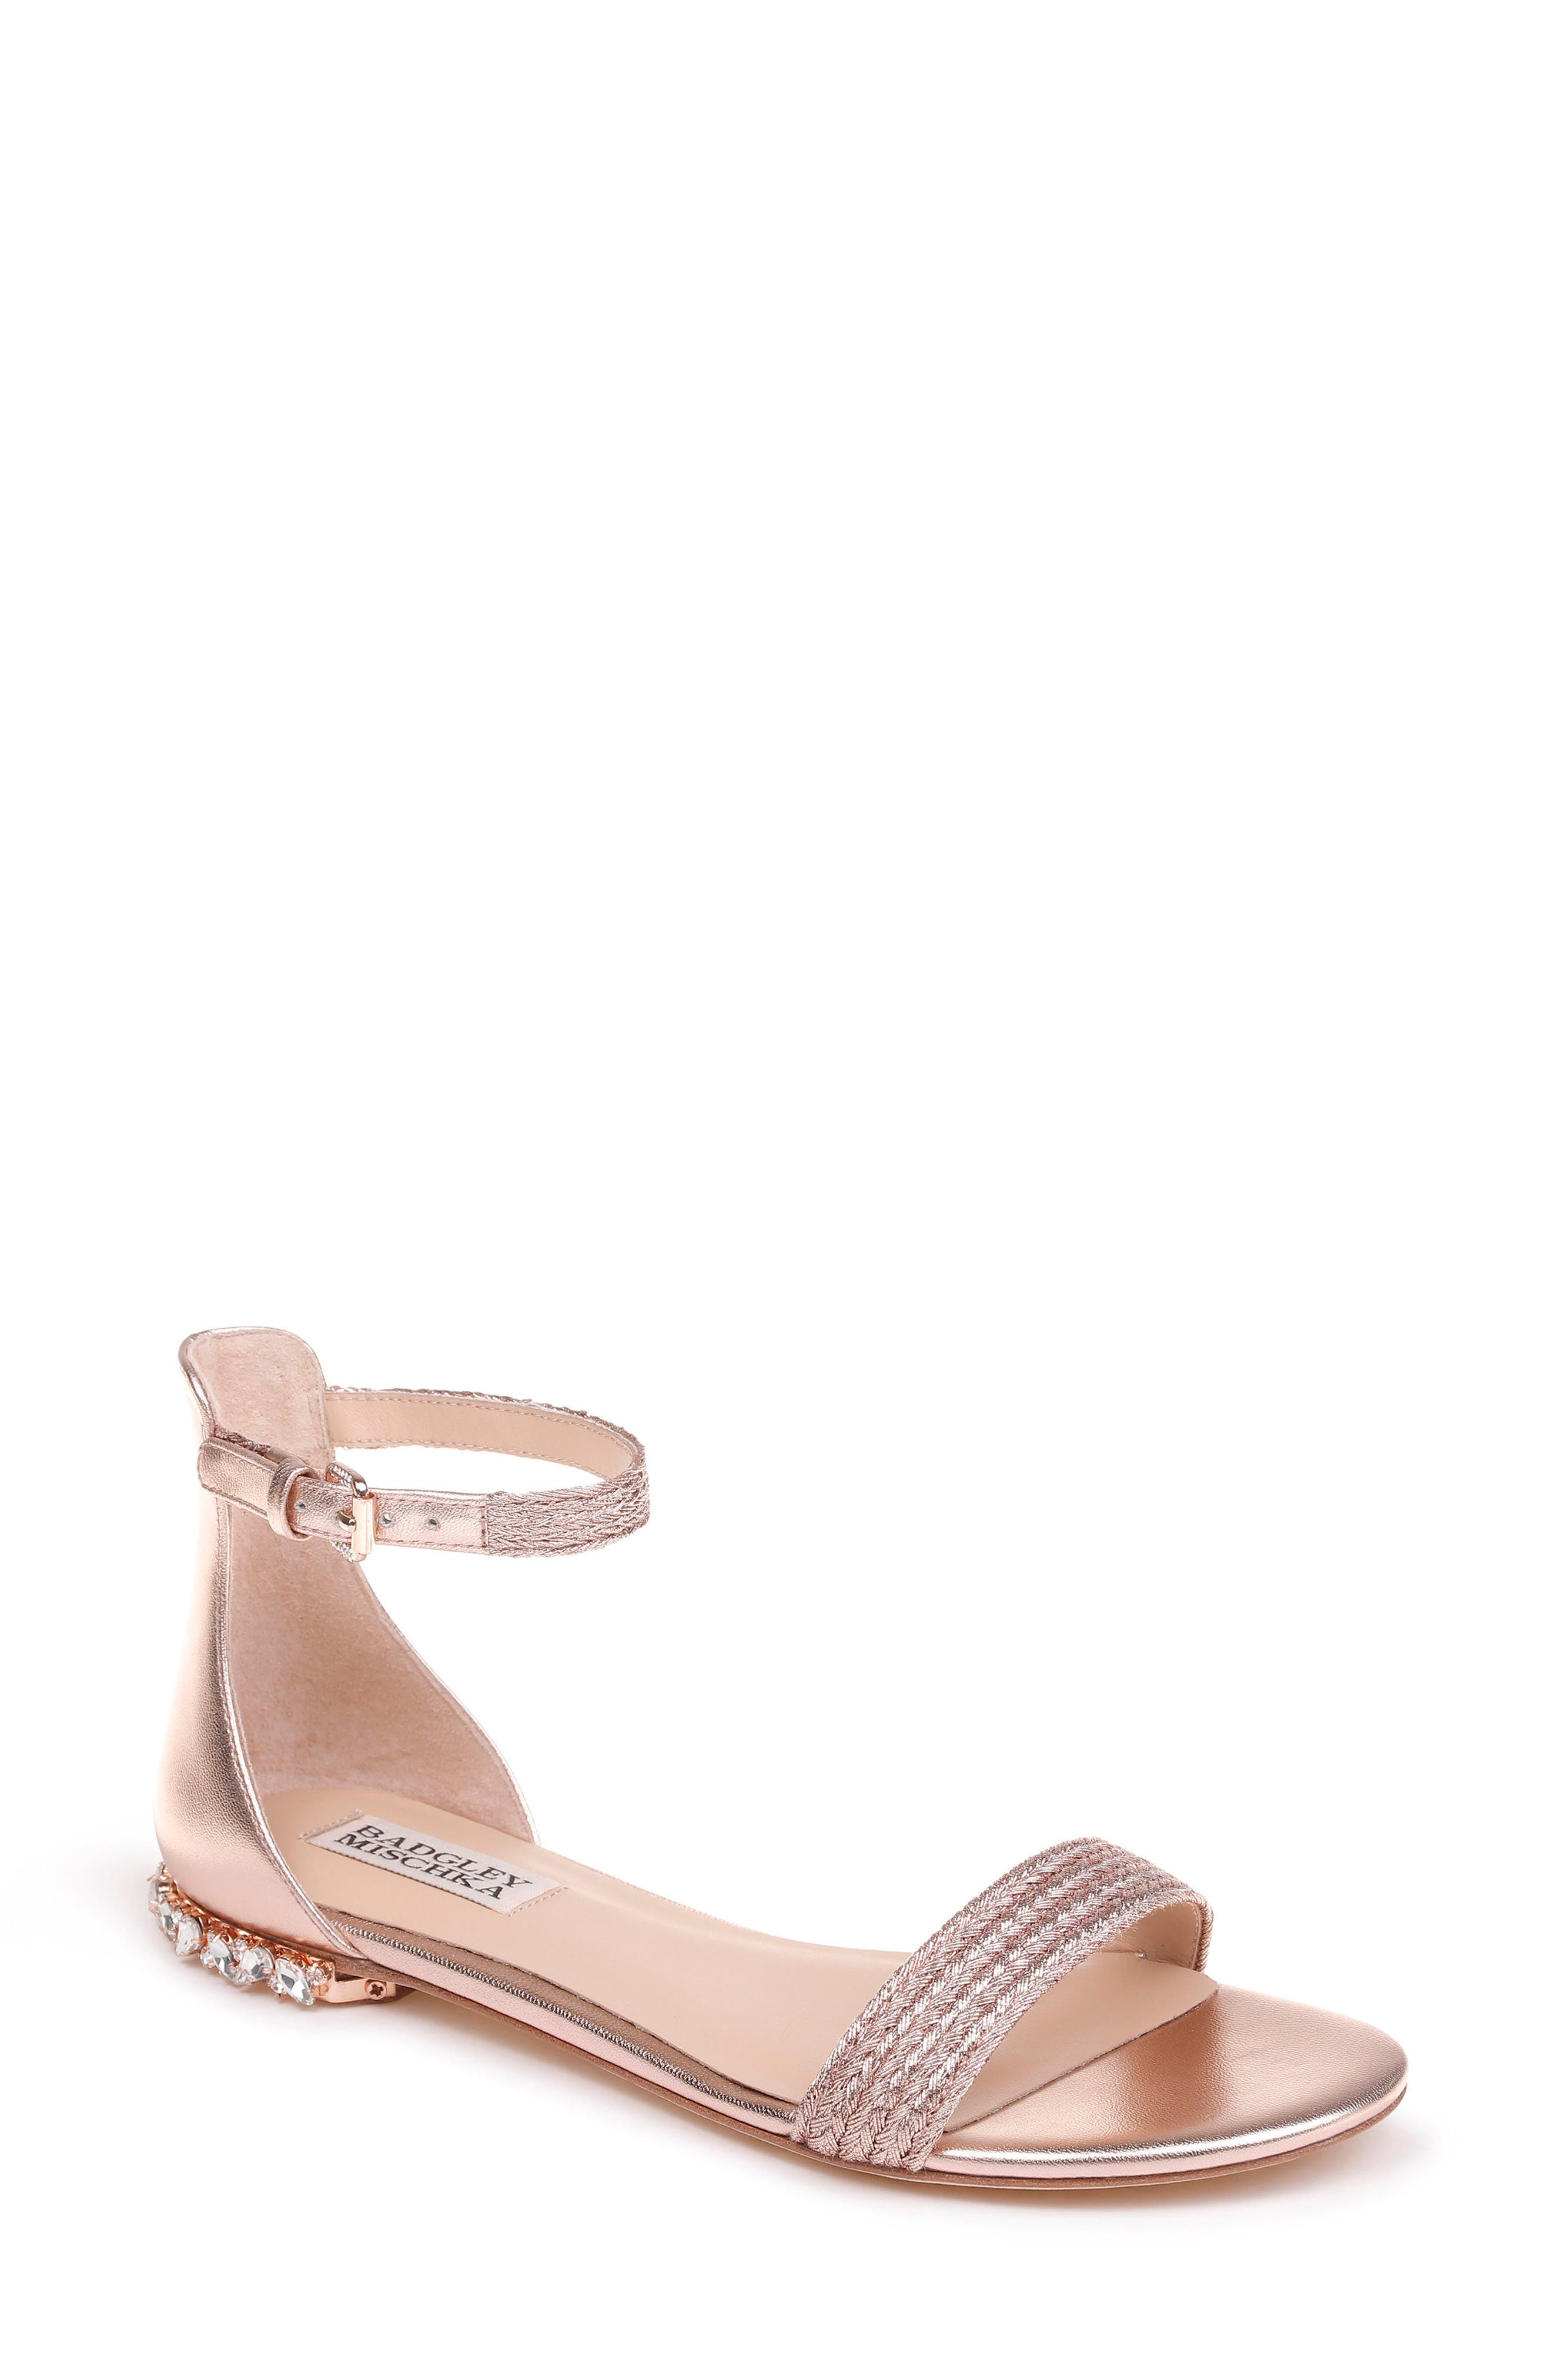 Steffie Ankle Strap Sandal,                         Main,                         color, ROSE GOLD LEATHER